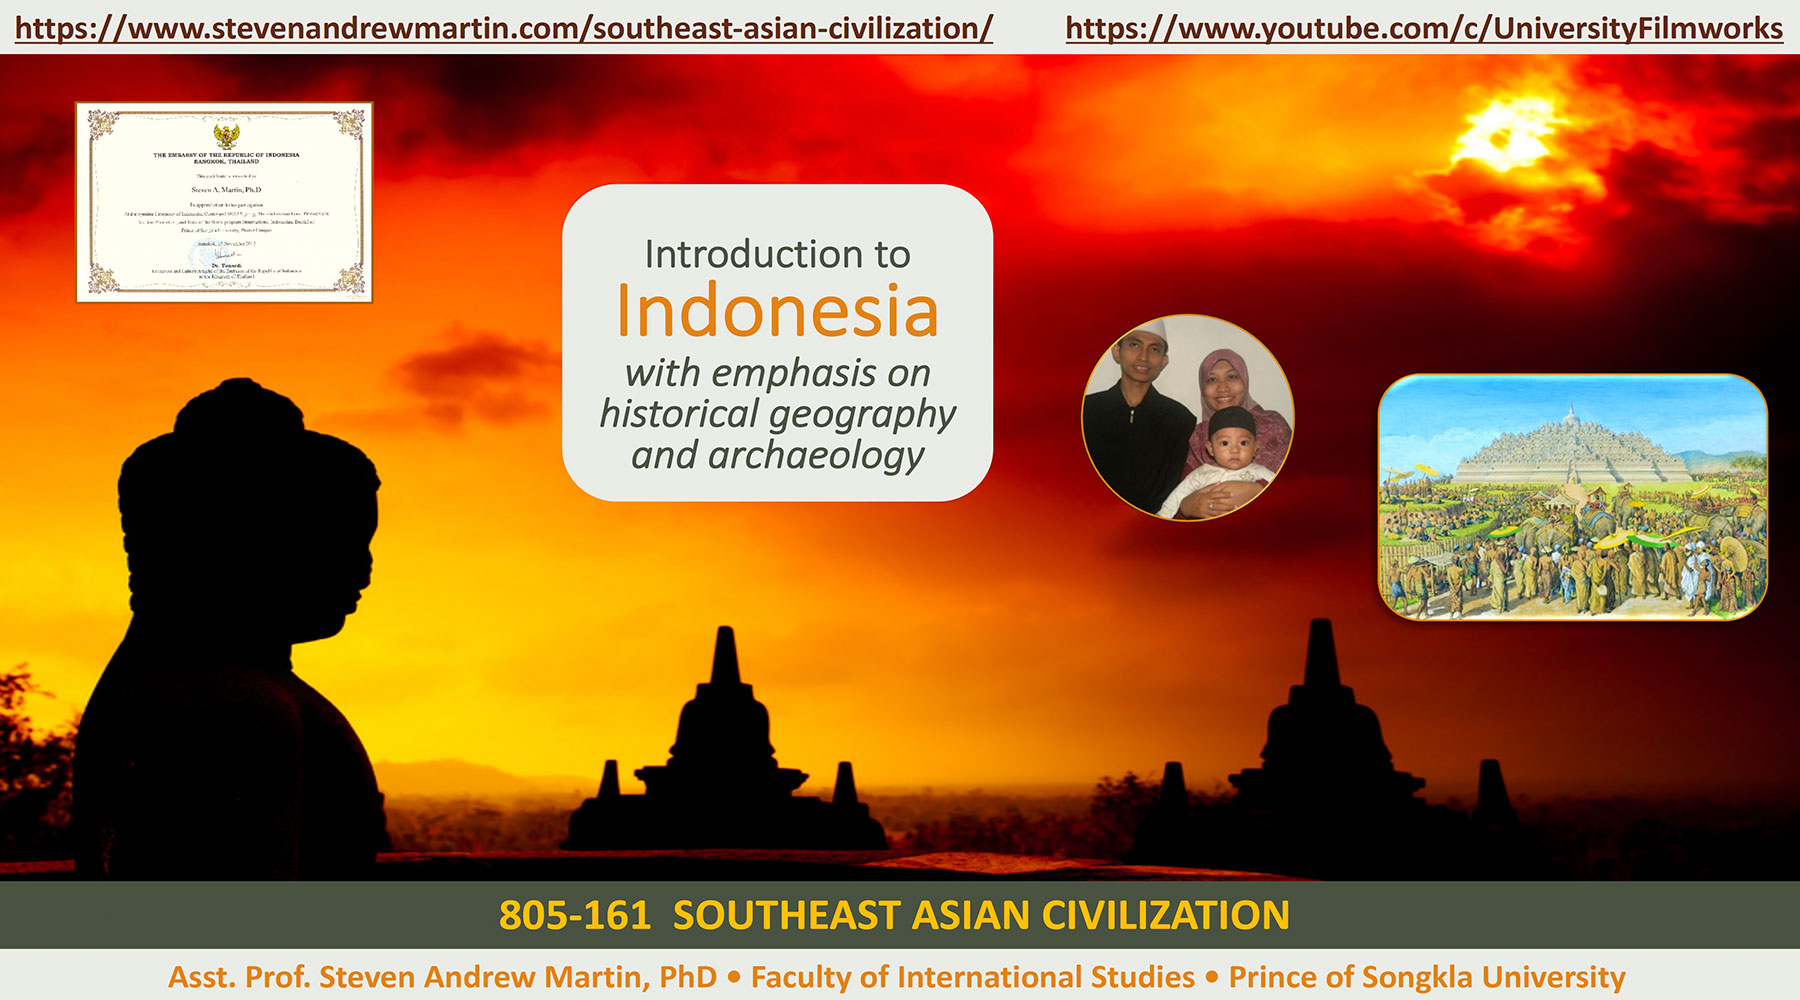 Professor Dr Steven Andrew Martin | Southeast Asian Civilization PowerPoint | Prince of Songkla University | Faculty of International Studies